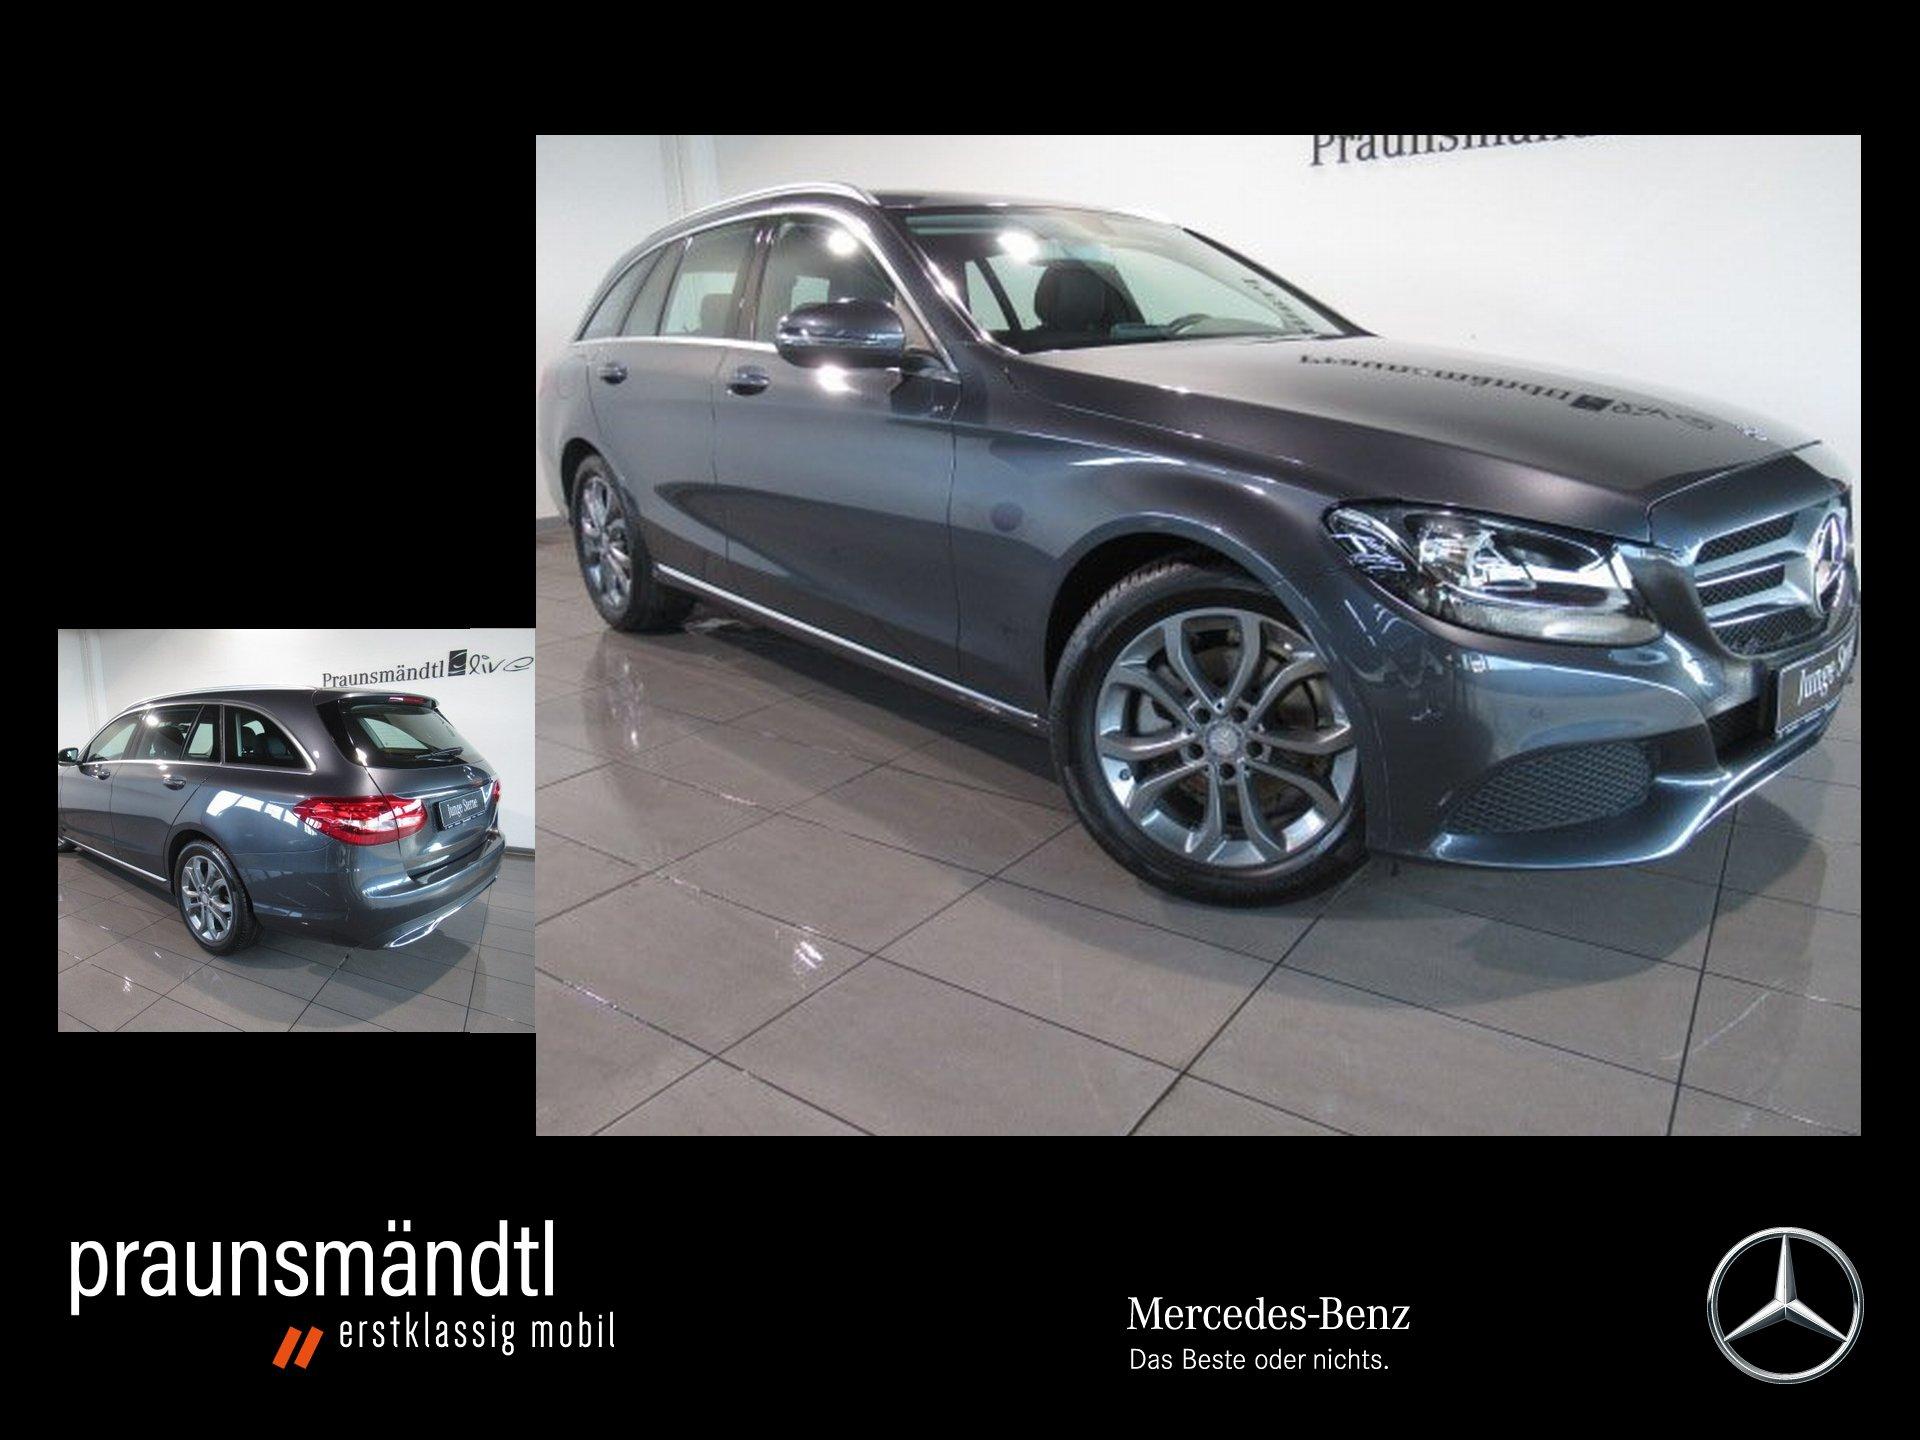 Mercedes-Benz C 180 T Avantgarde PTS/Navi/SHZ/Tempomat/LMR 17, Jahr 2015, Benzin